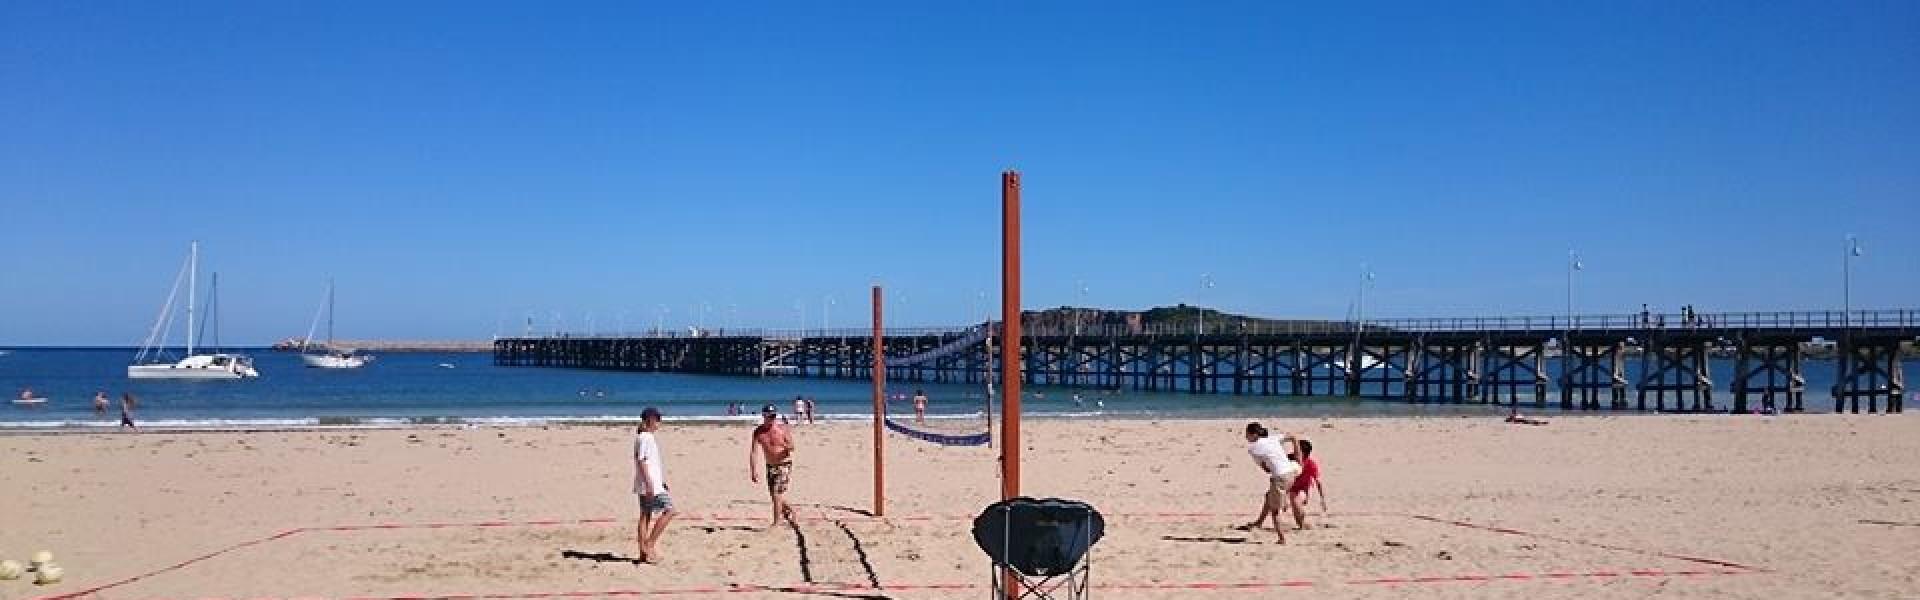 beach court